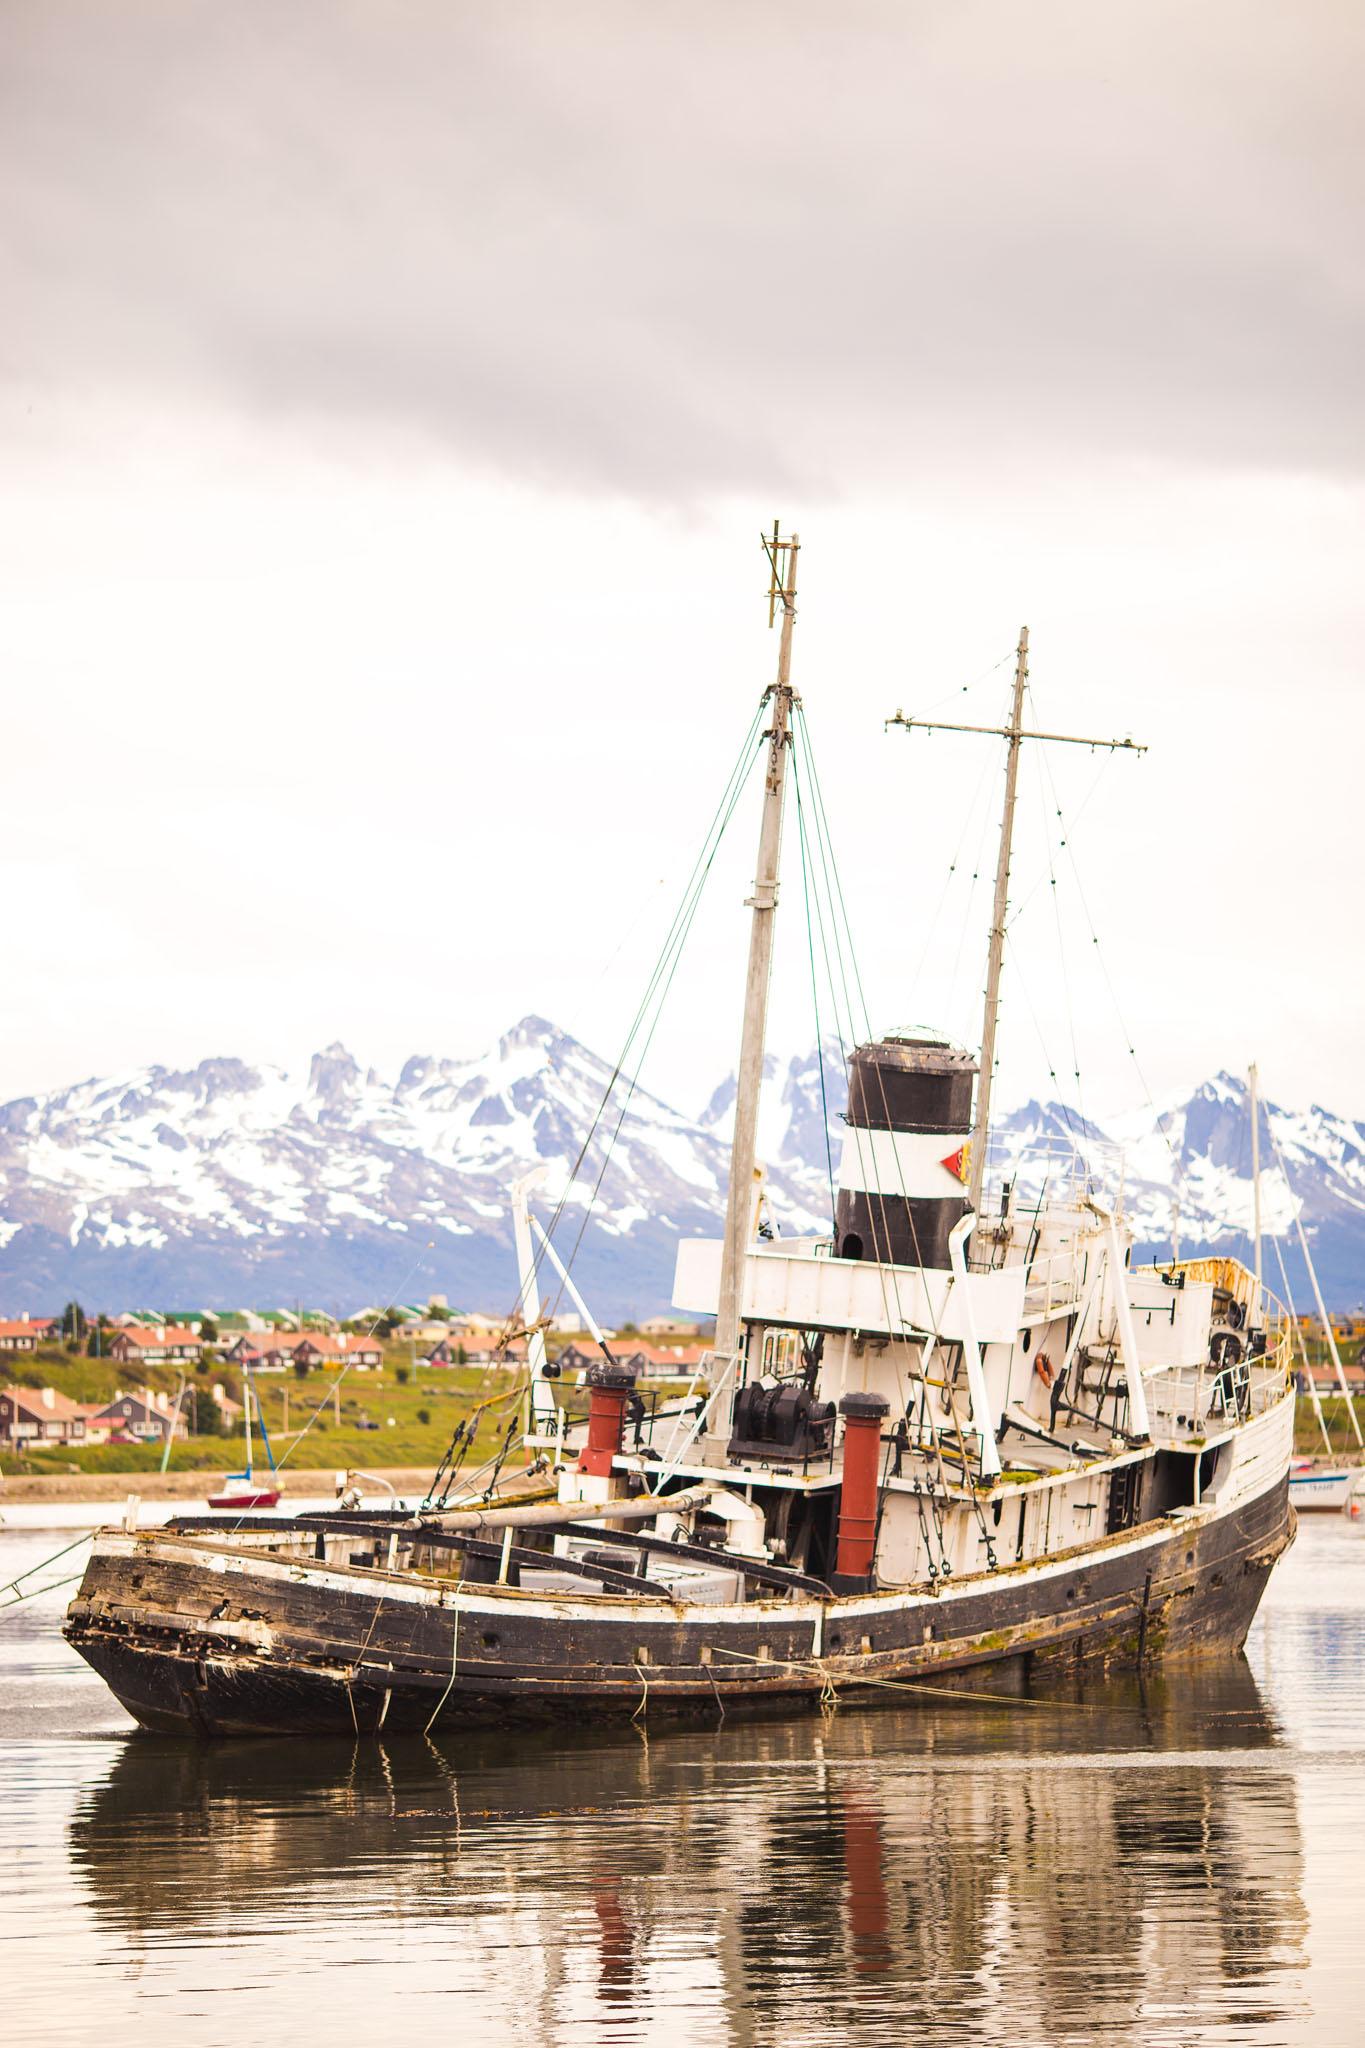 Wedding-travellers-ushuaia-argentina-fin-del-mundo-historic-old-ship